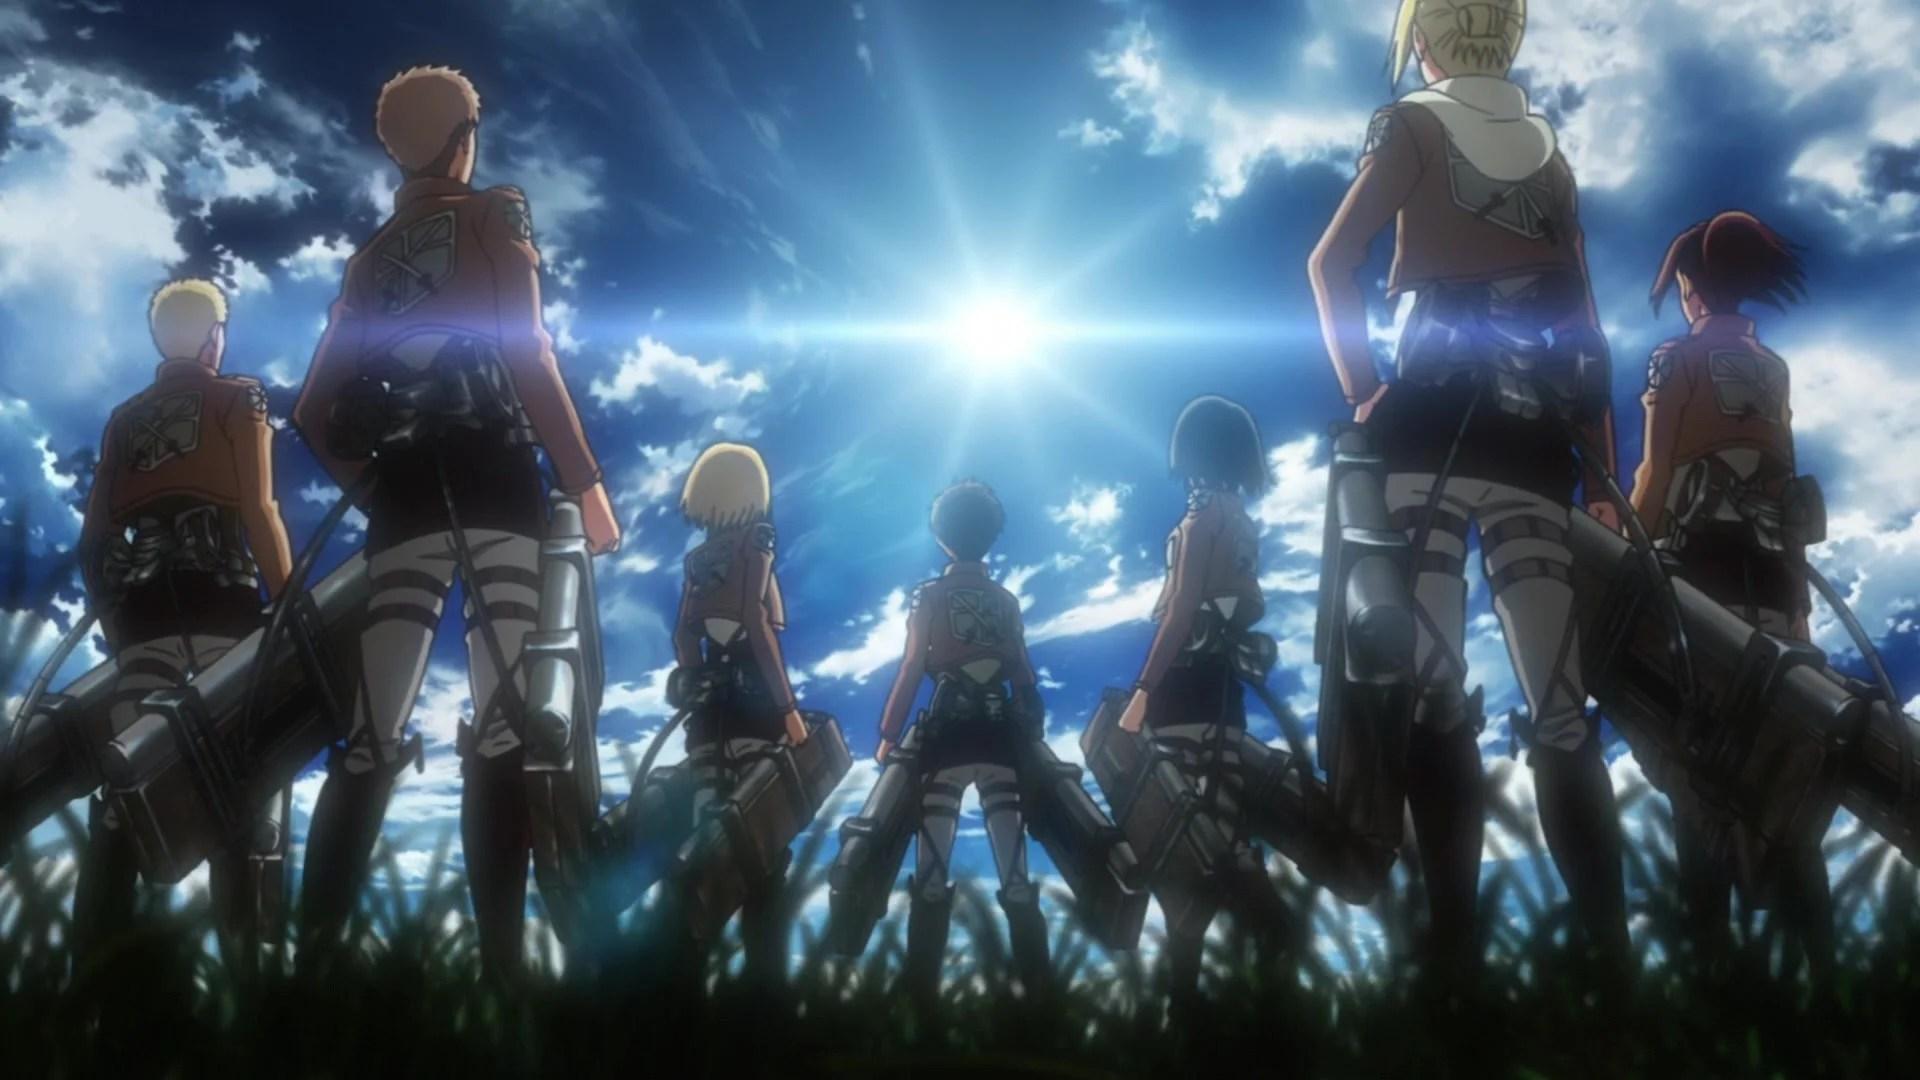 Attack on titan wallpaper, digital art, artwork, anime, anime boys. 134+ Attack on Titan Live